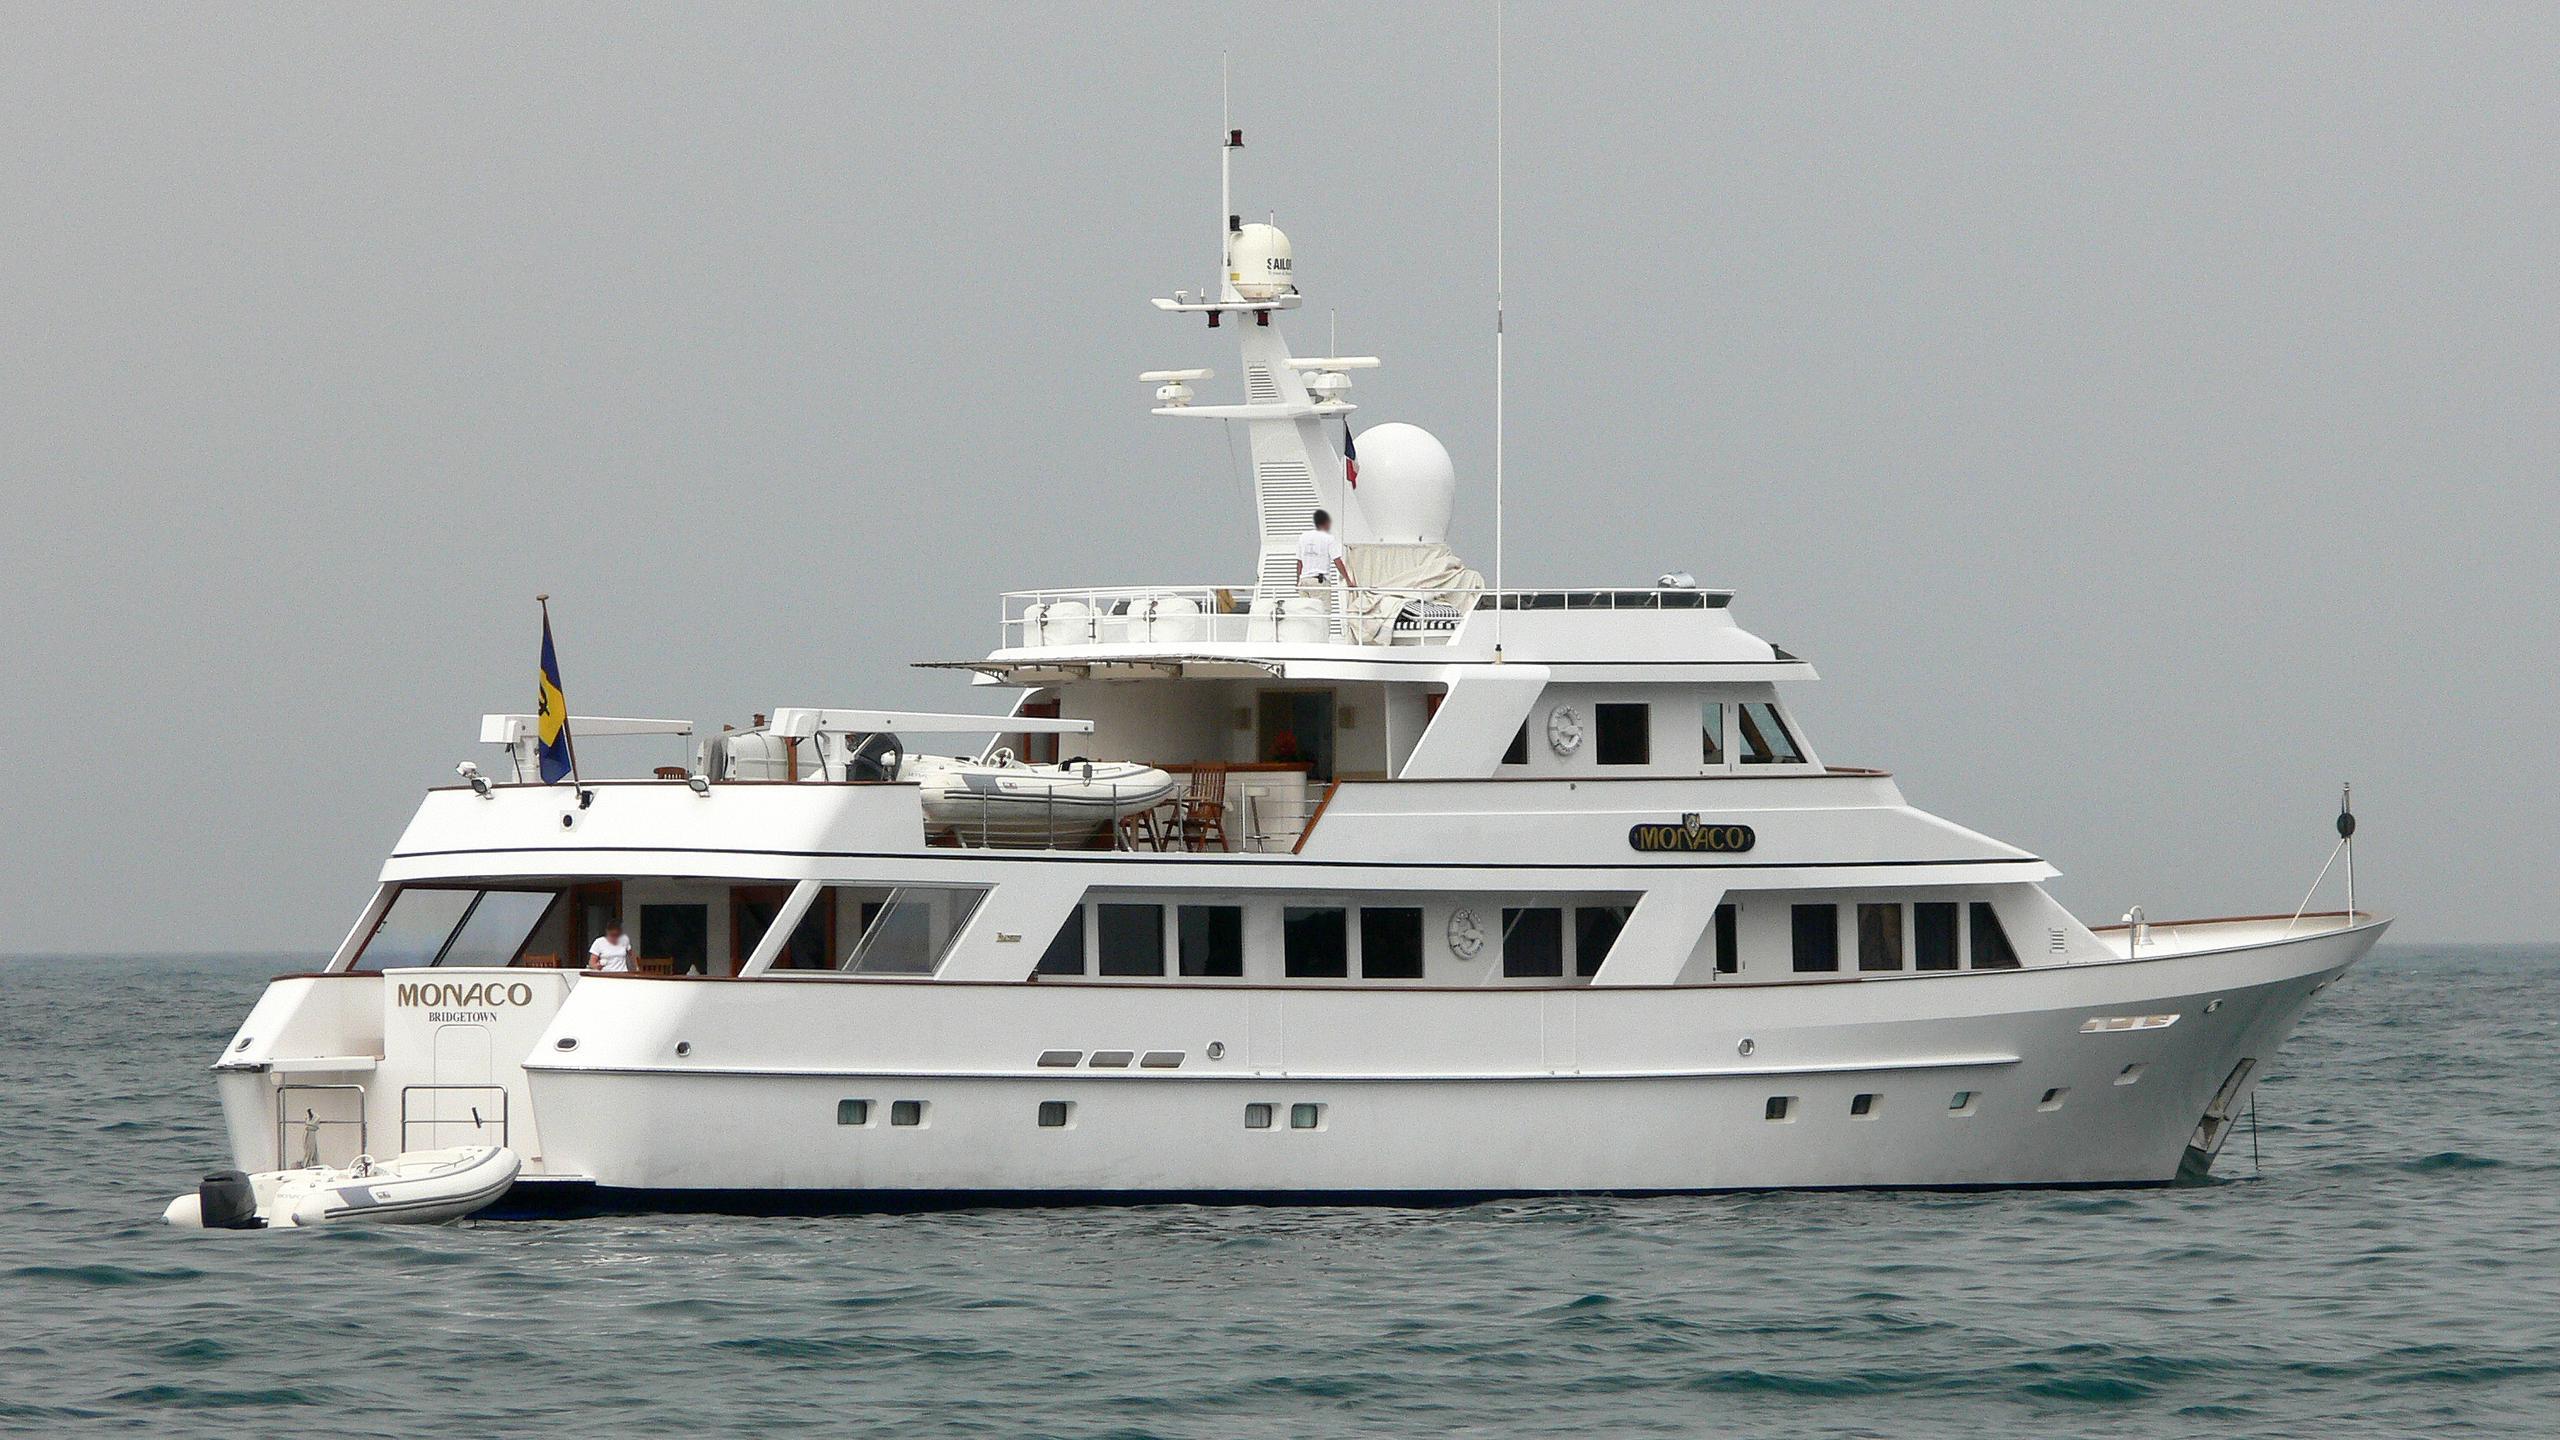 monaco-motor-yacht-feadship-1981-38m-half-profile